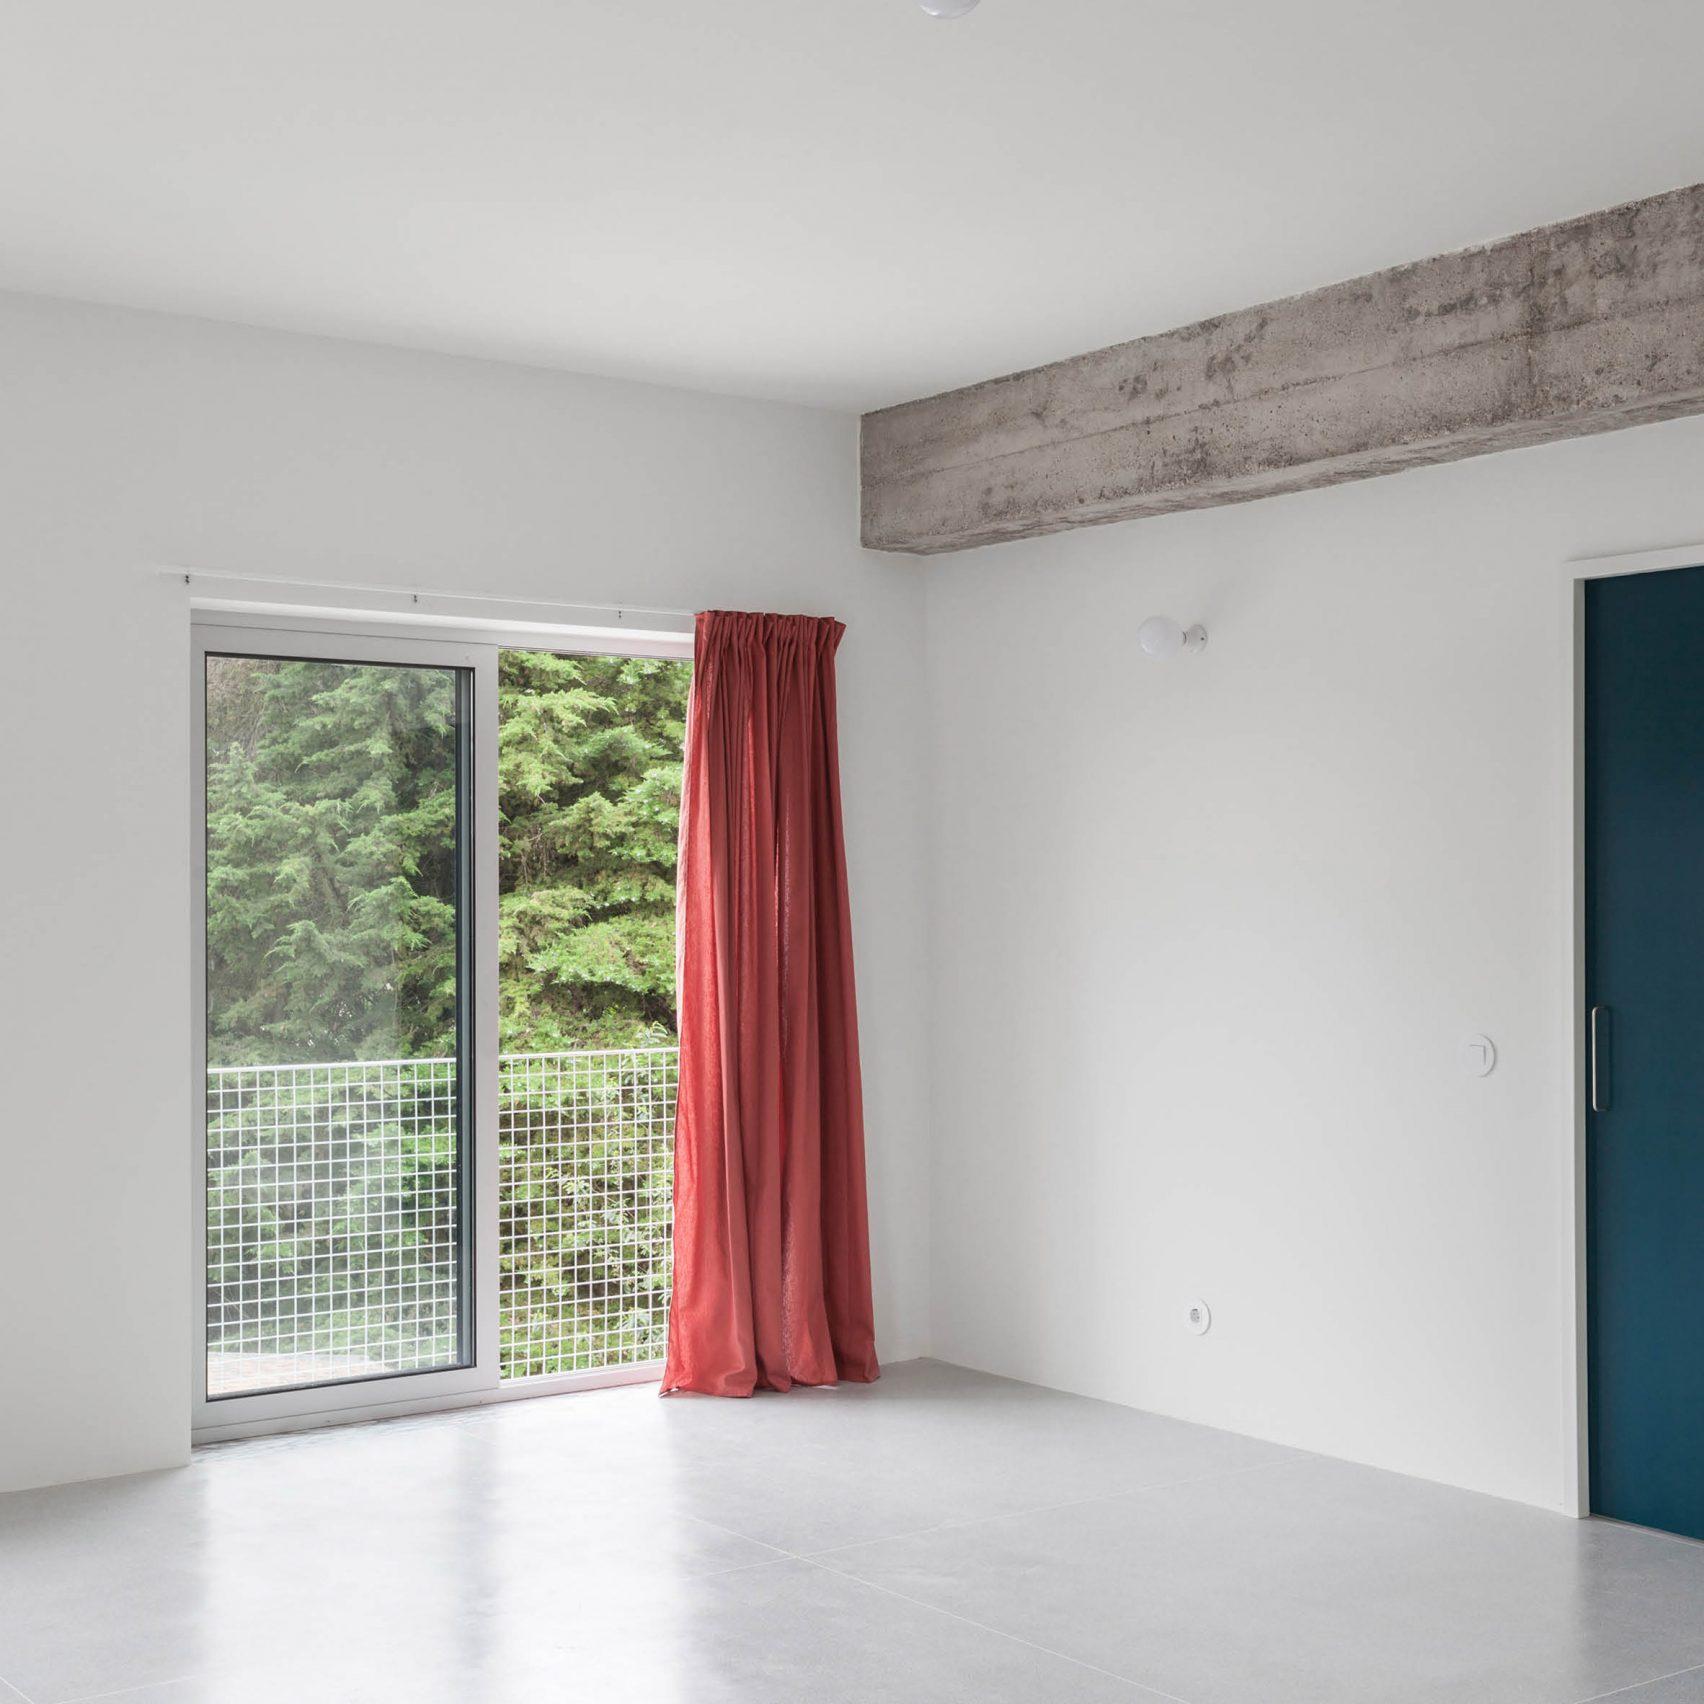 Housing Abragão by Fala Atelier